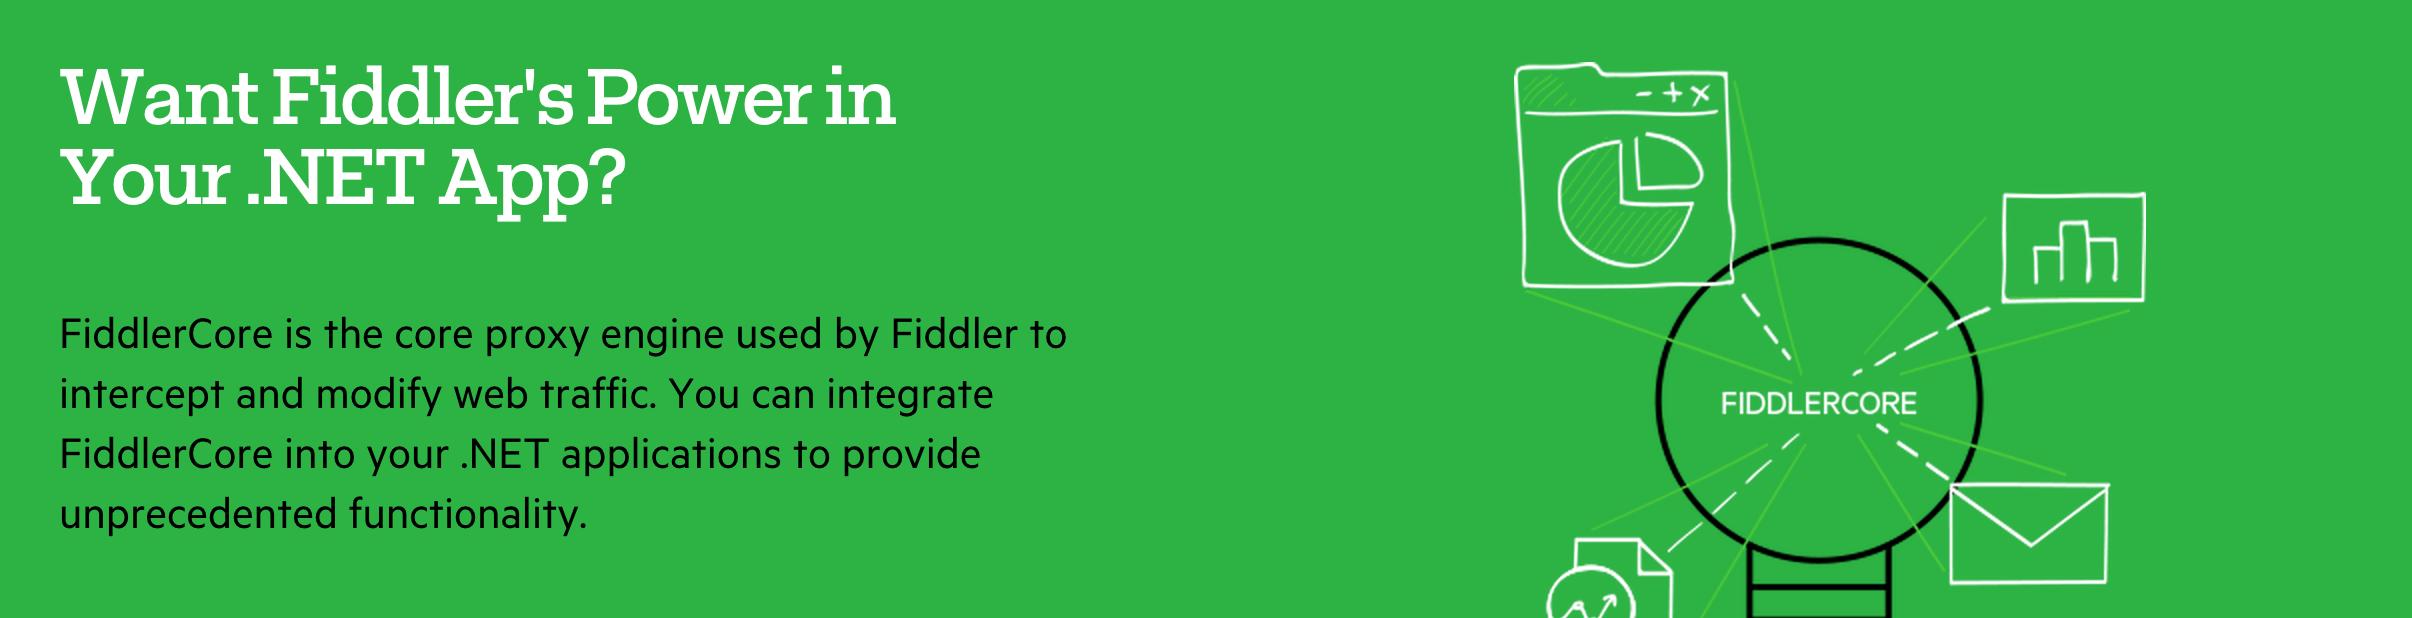 Fiddler Core